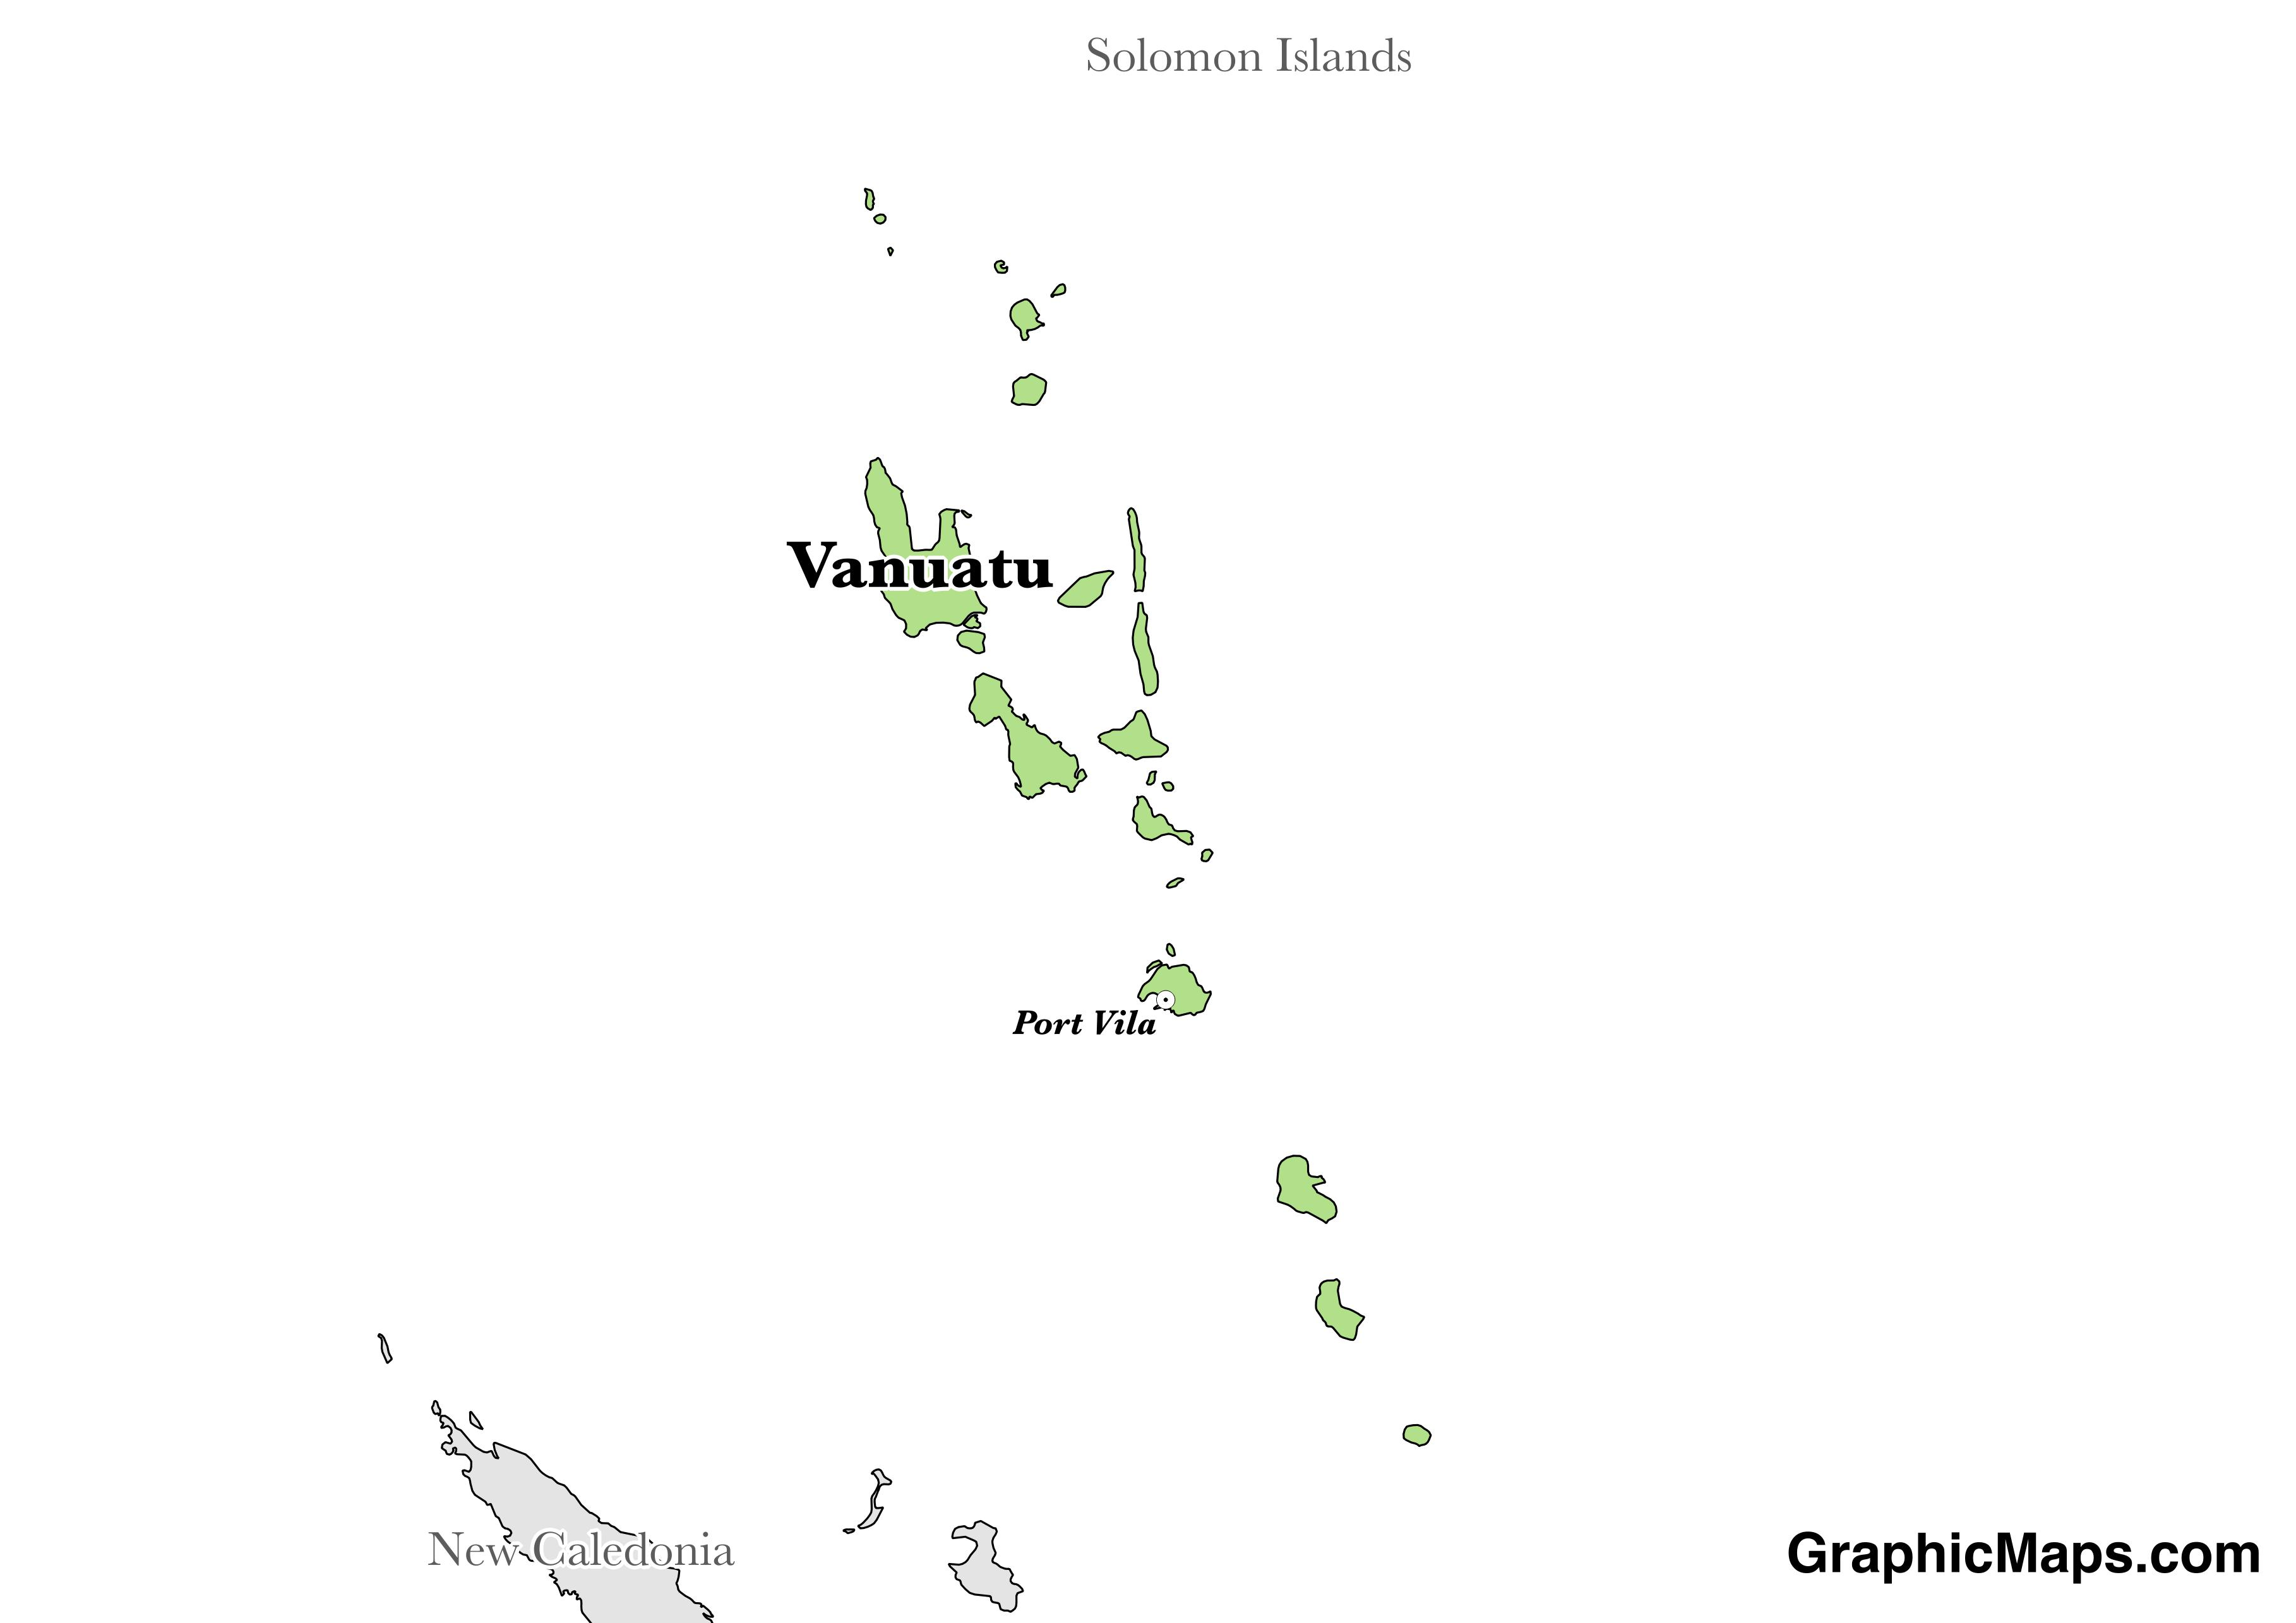 Map showing the location of Vanuatu